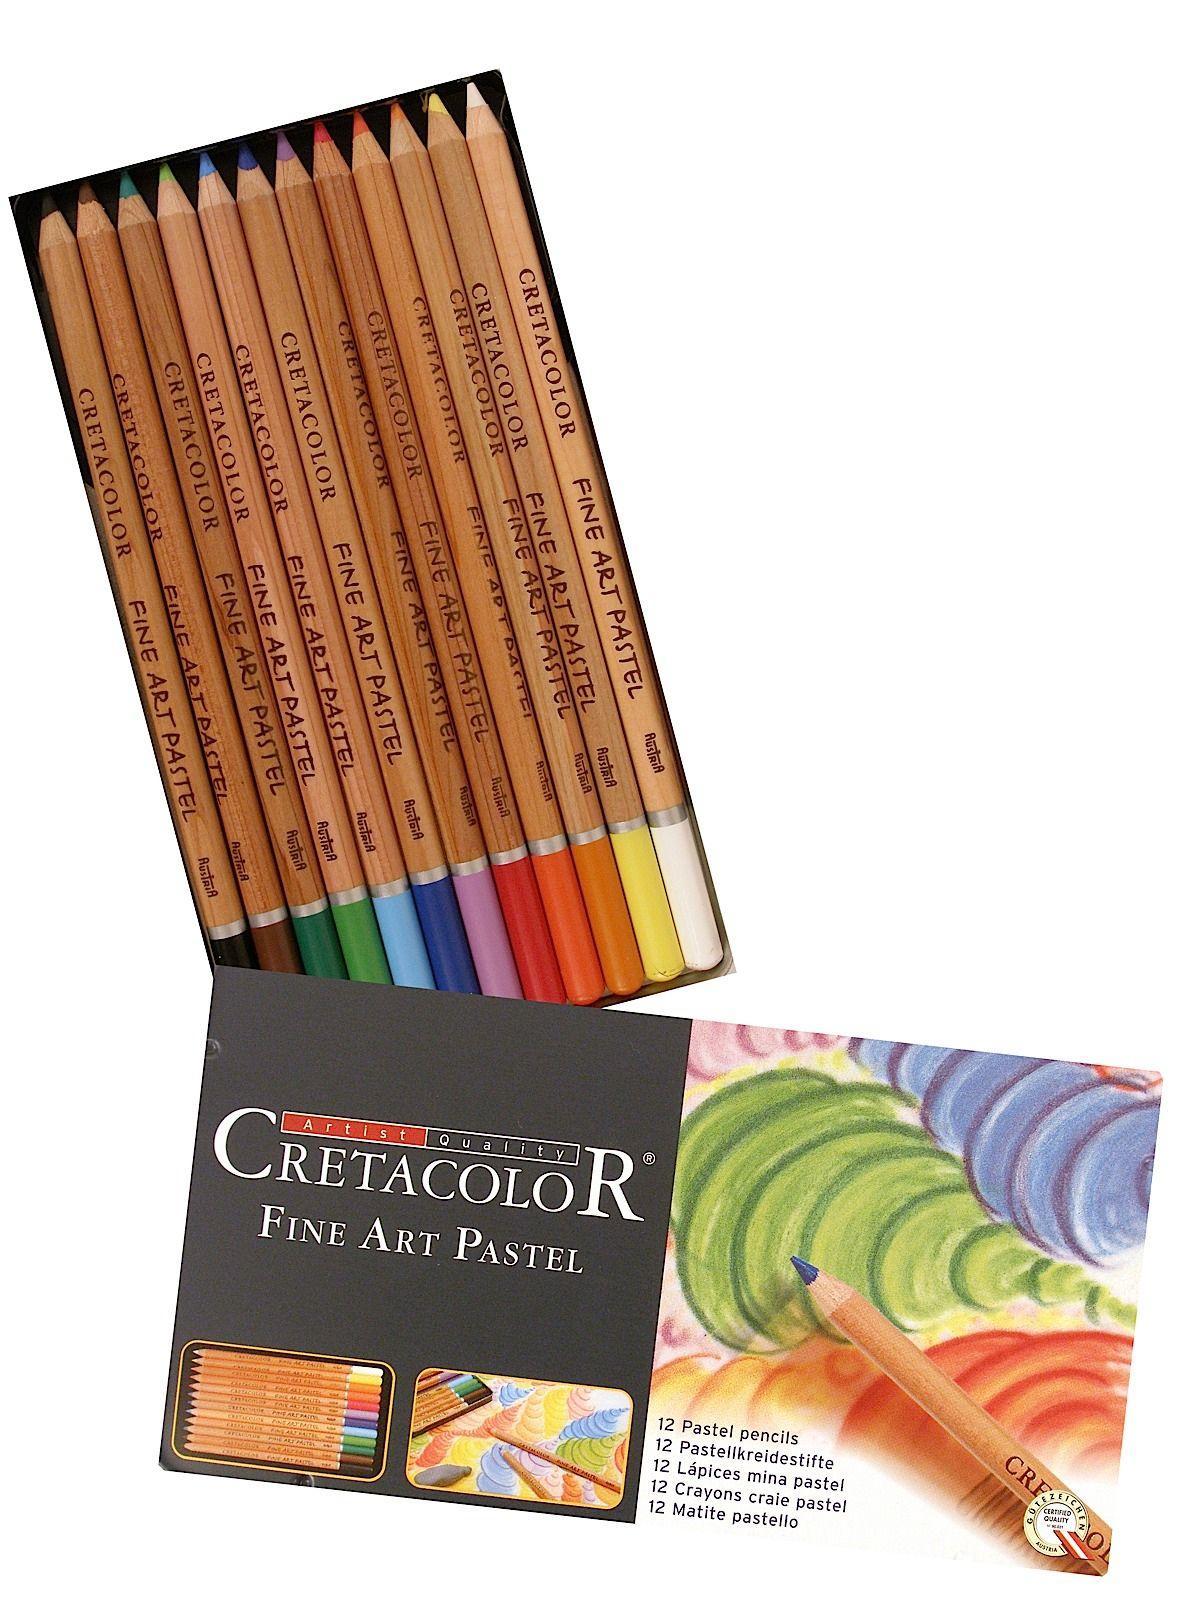 Cretacolor Pastel Pencils Ad Art Crafts Arts Supplies Artist Ad